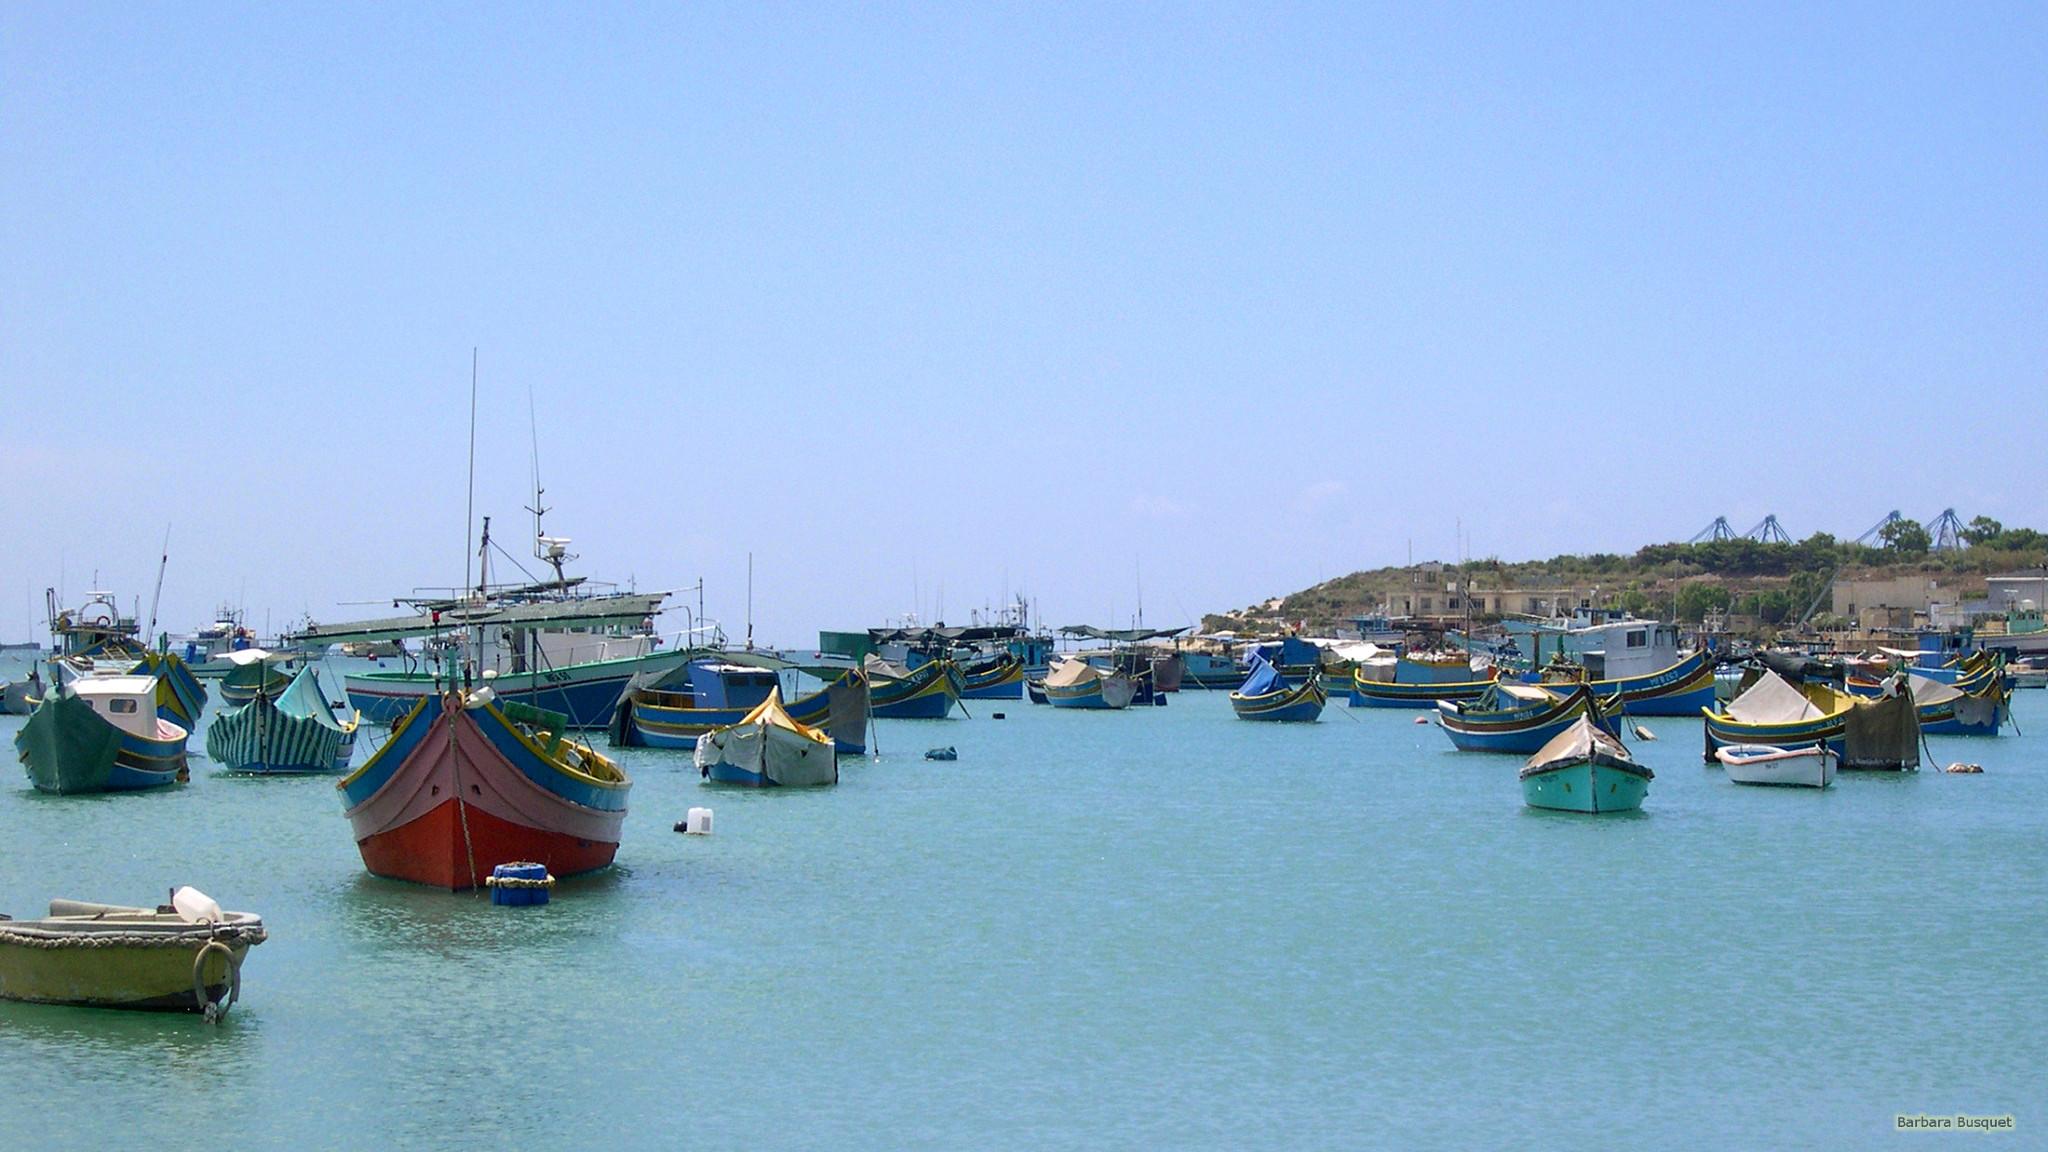 Res: 2048x1152, Malta wallpaper boats in blue Mediterranean Sea